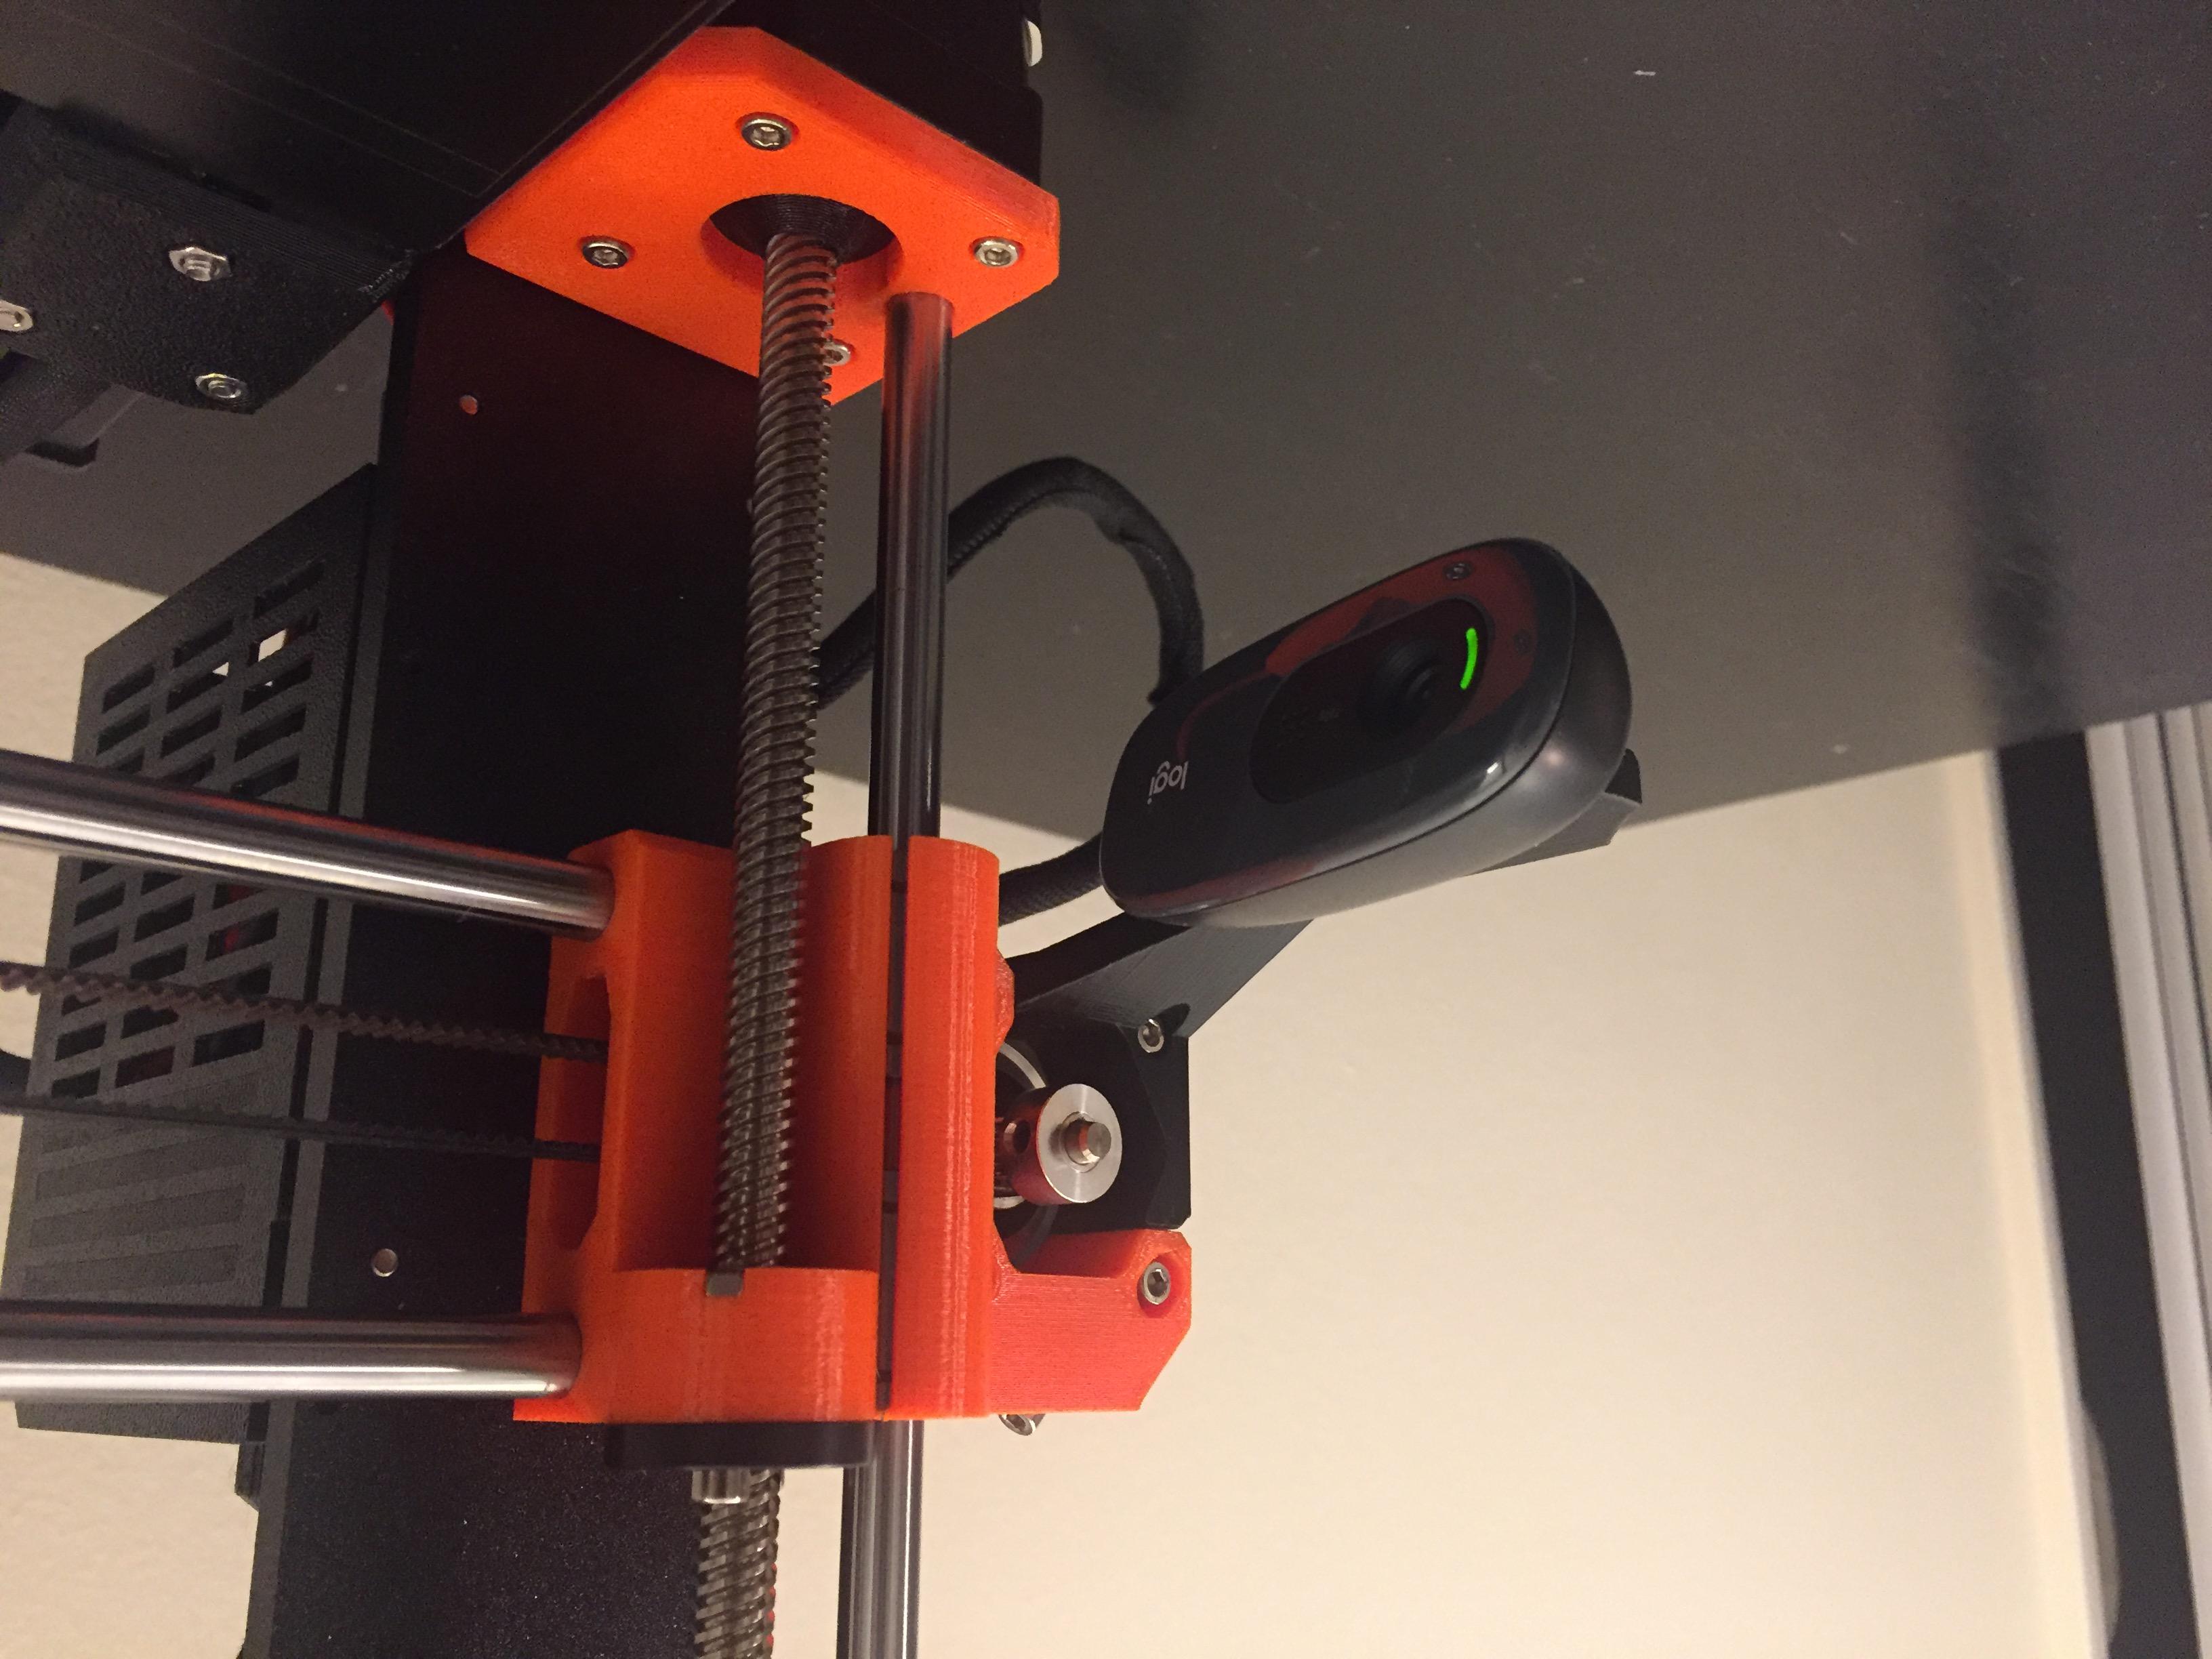 Logitech C270 Mount Prusa i3 Mk3 #3DThursday #3DPrinting